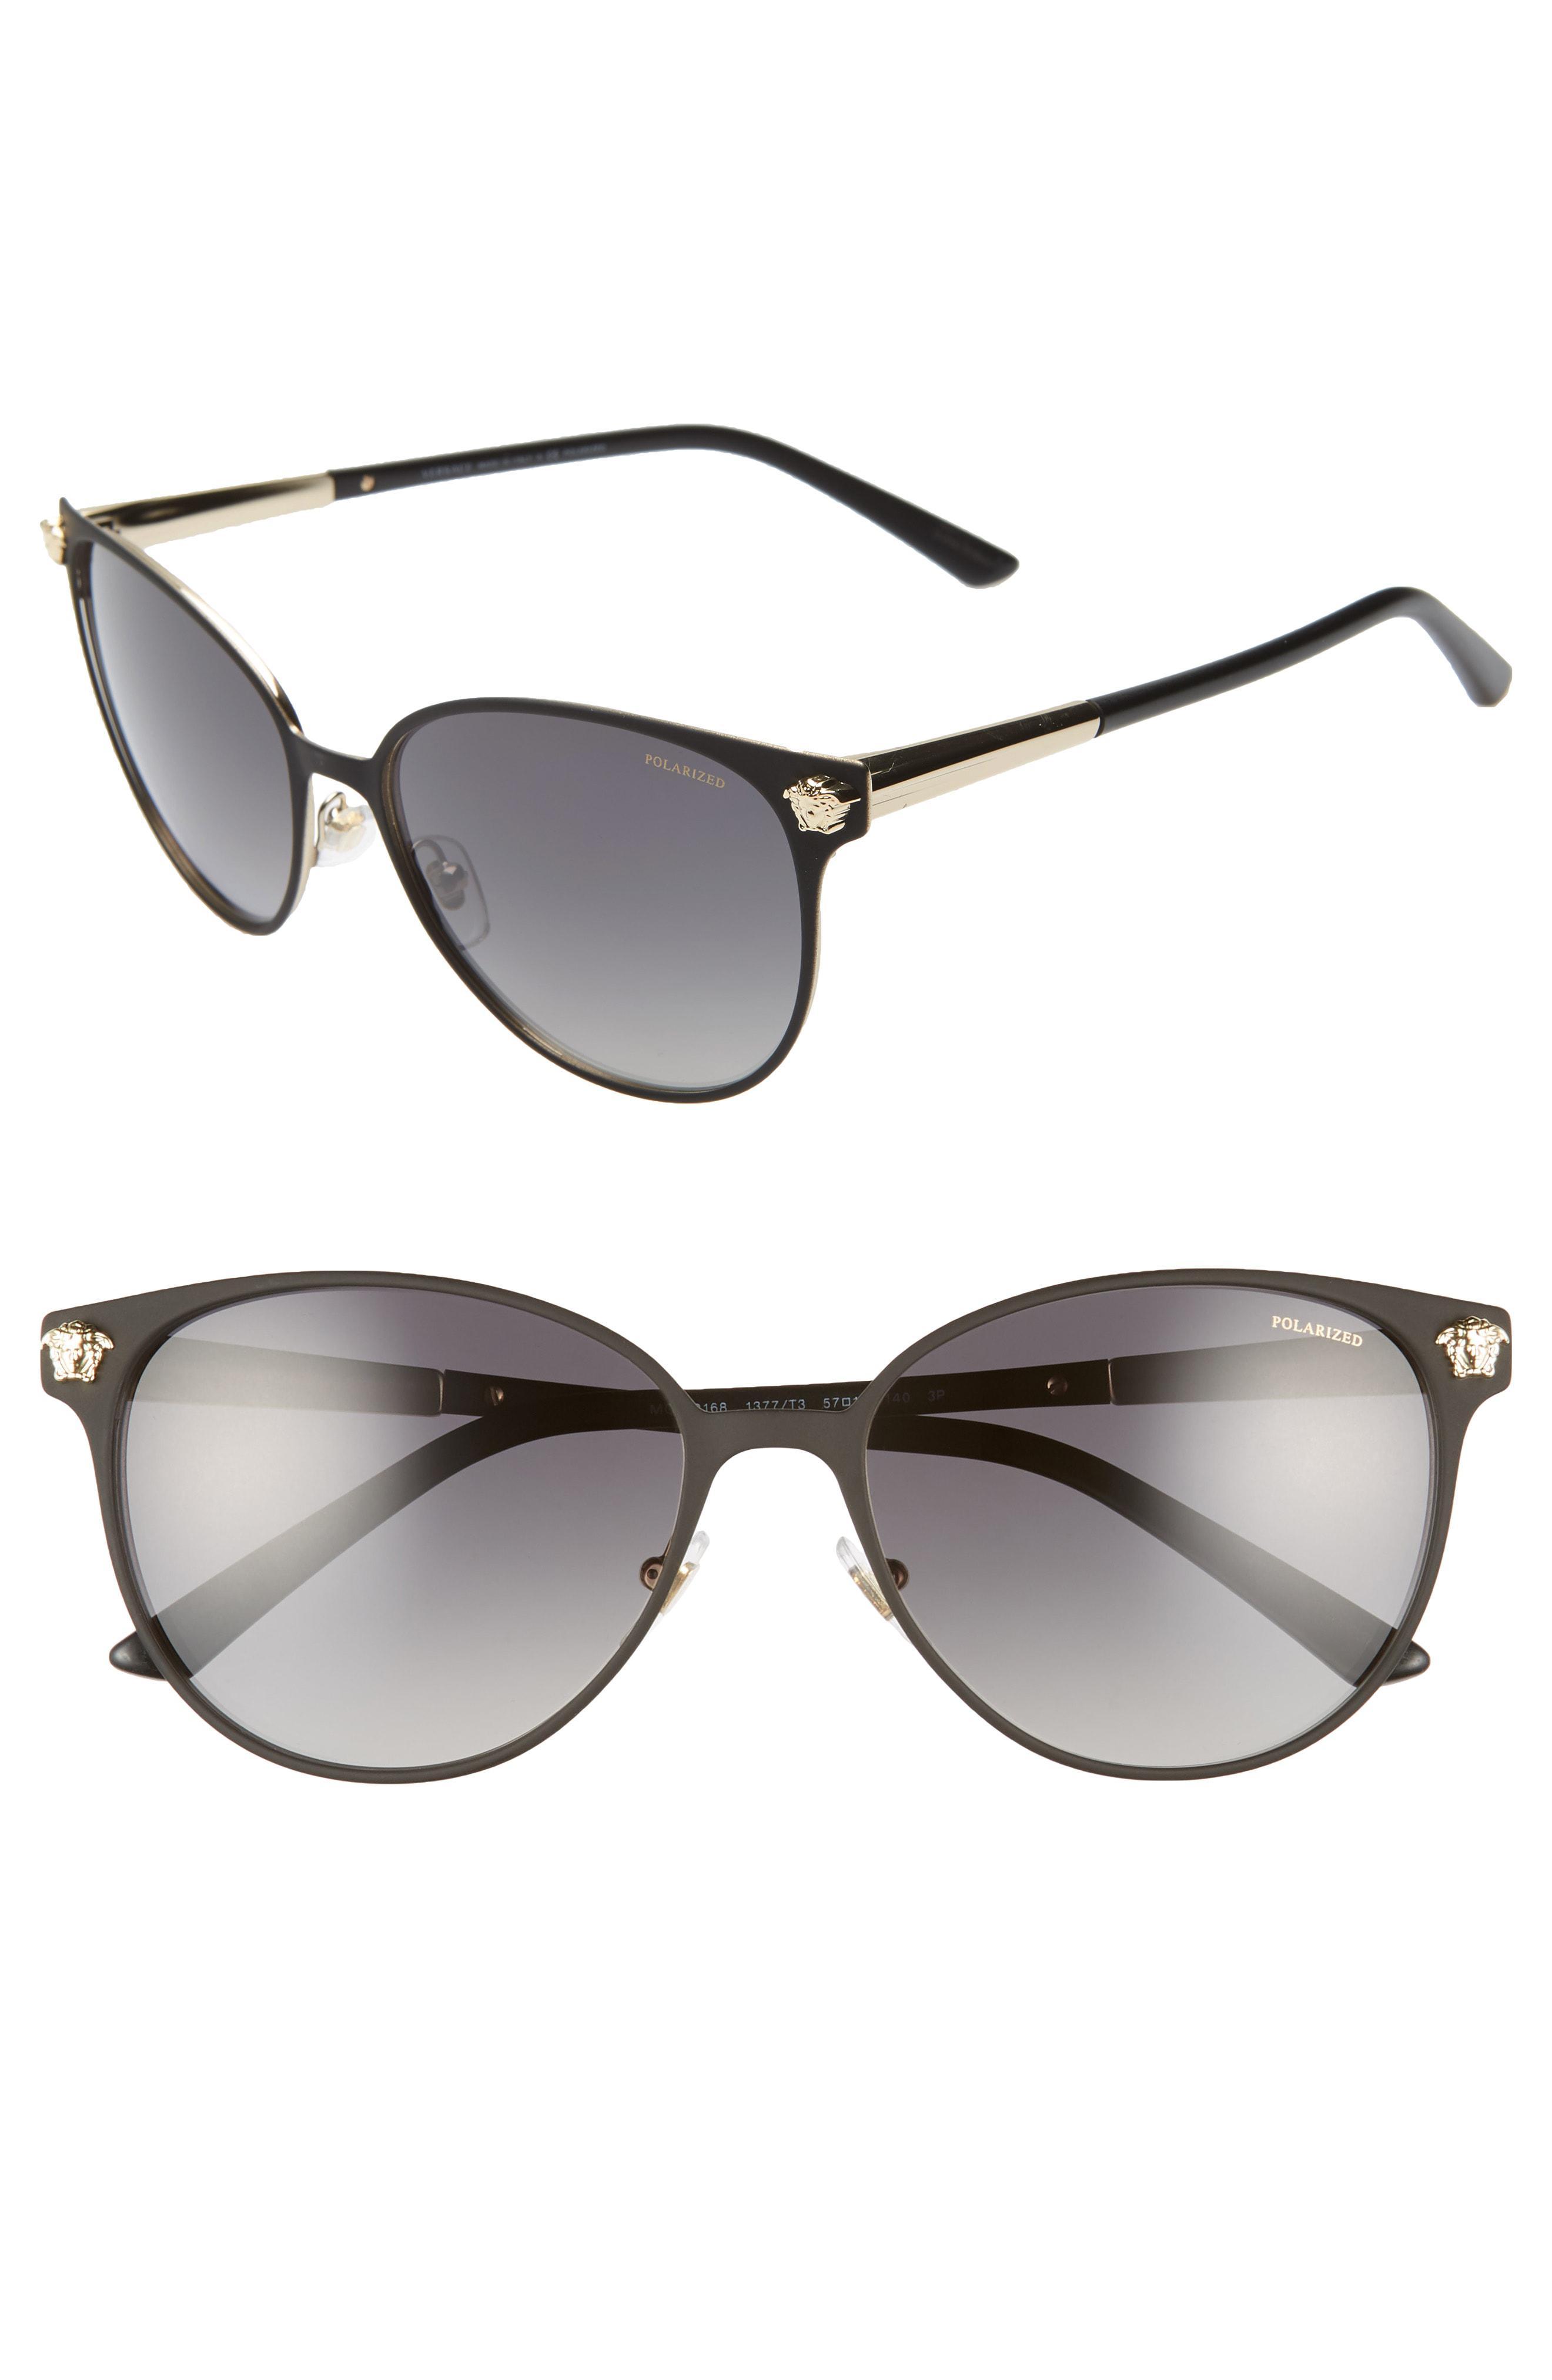 0b77ee95cd05 Lyst - Versace 57mm Gradient Cat Eye Sunglasses - in Gray